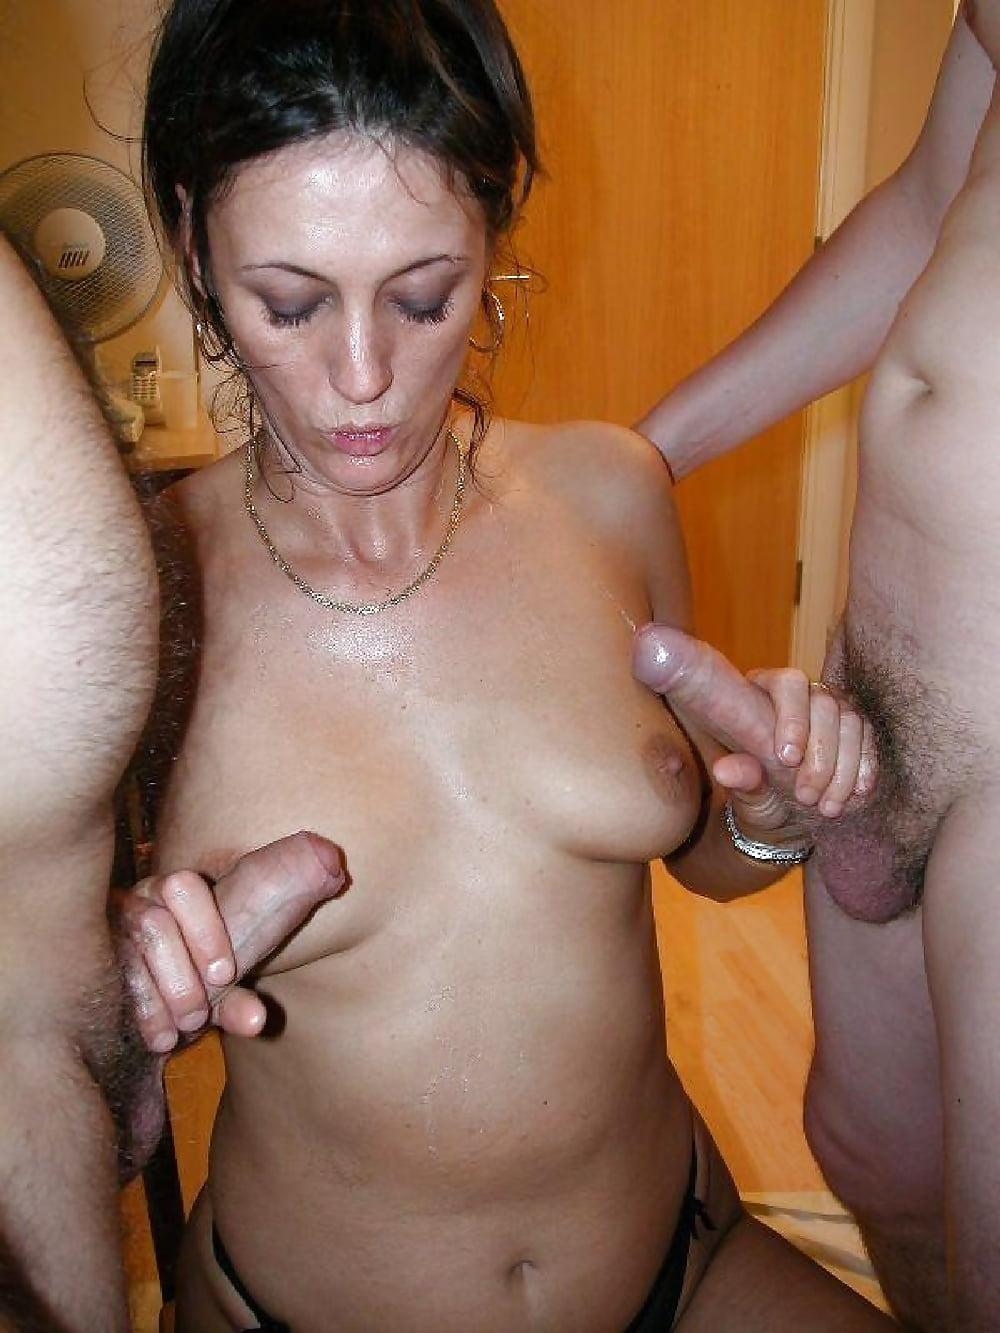 на фото жена пенис сосет и дрочит